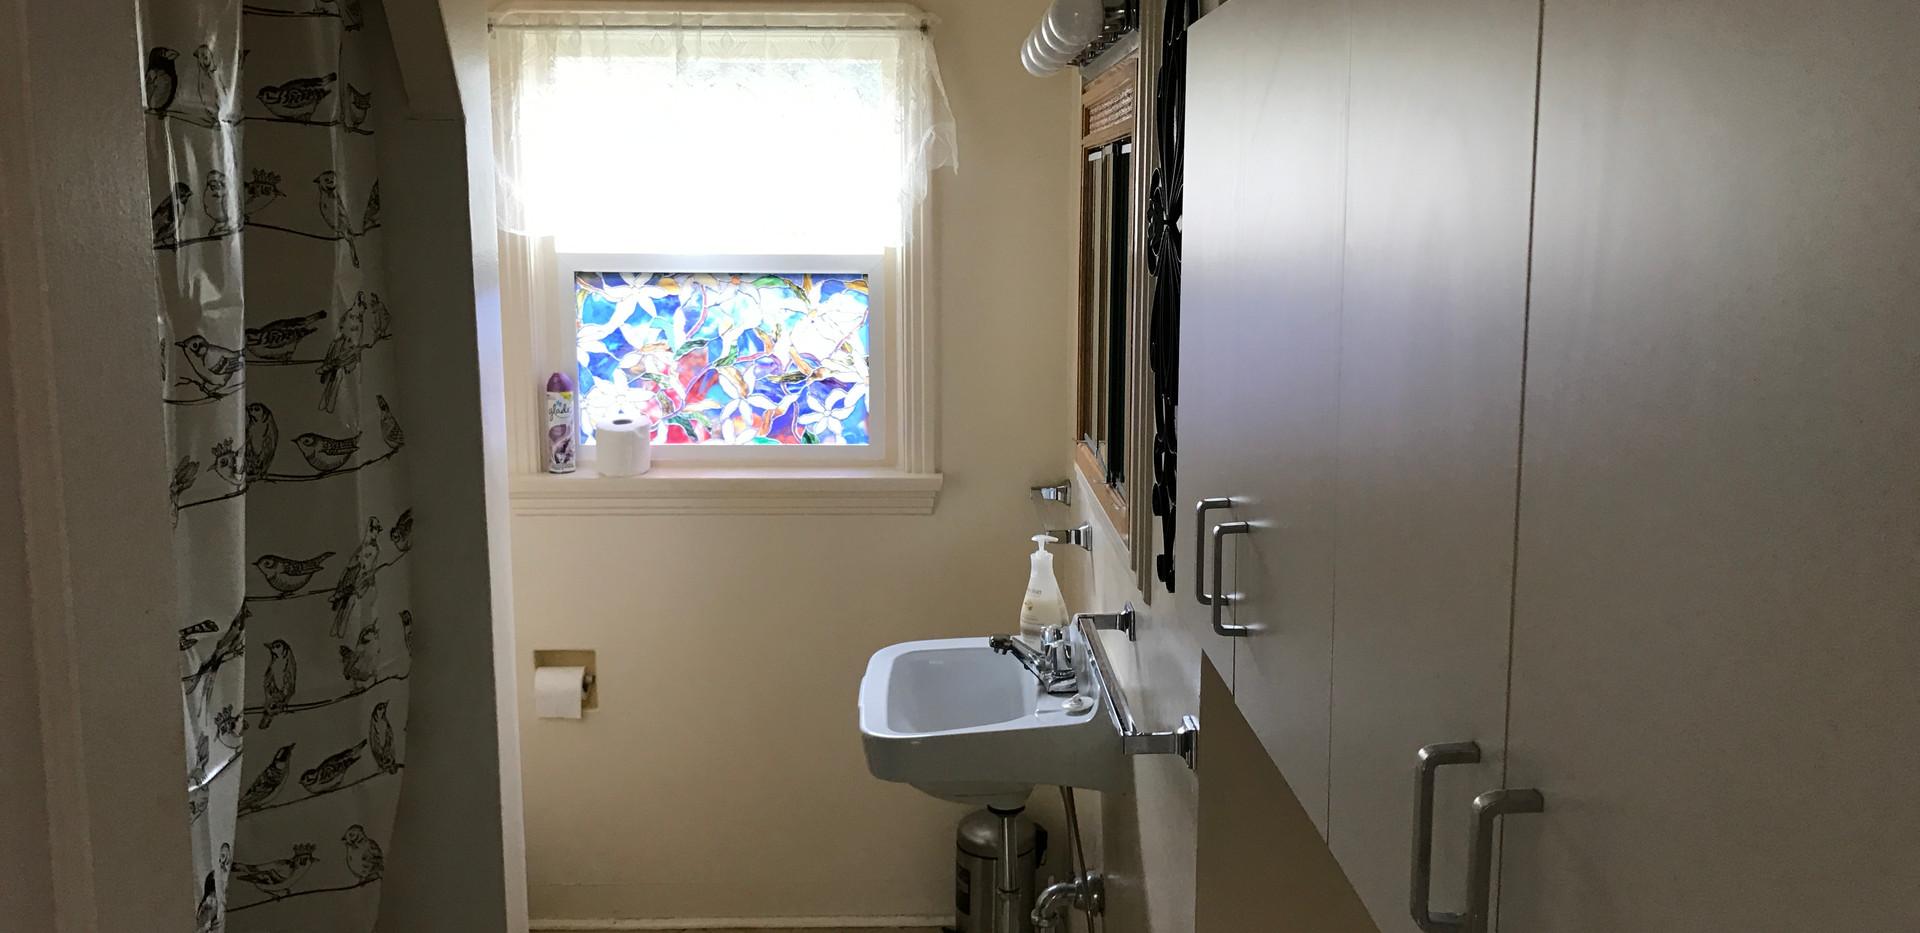 #4 Hyacinth - Bathroom #1 (upstairs).JPG